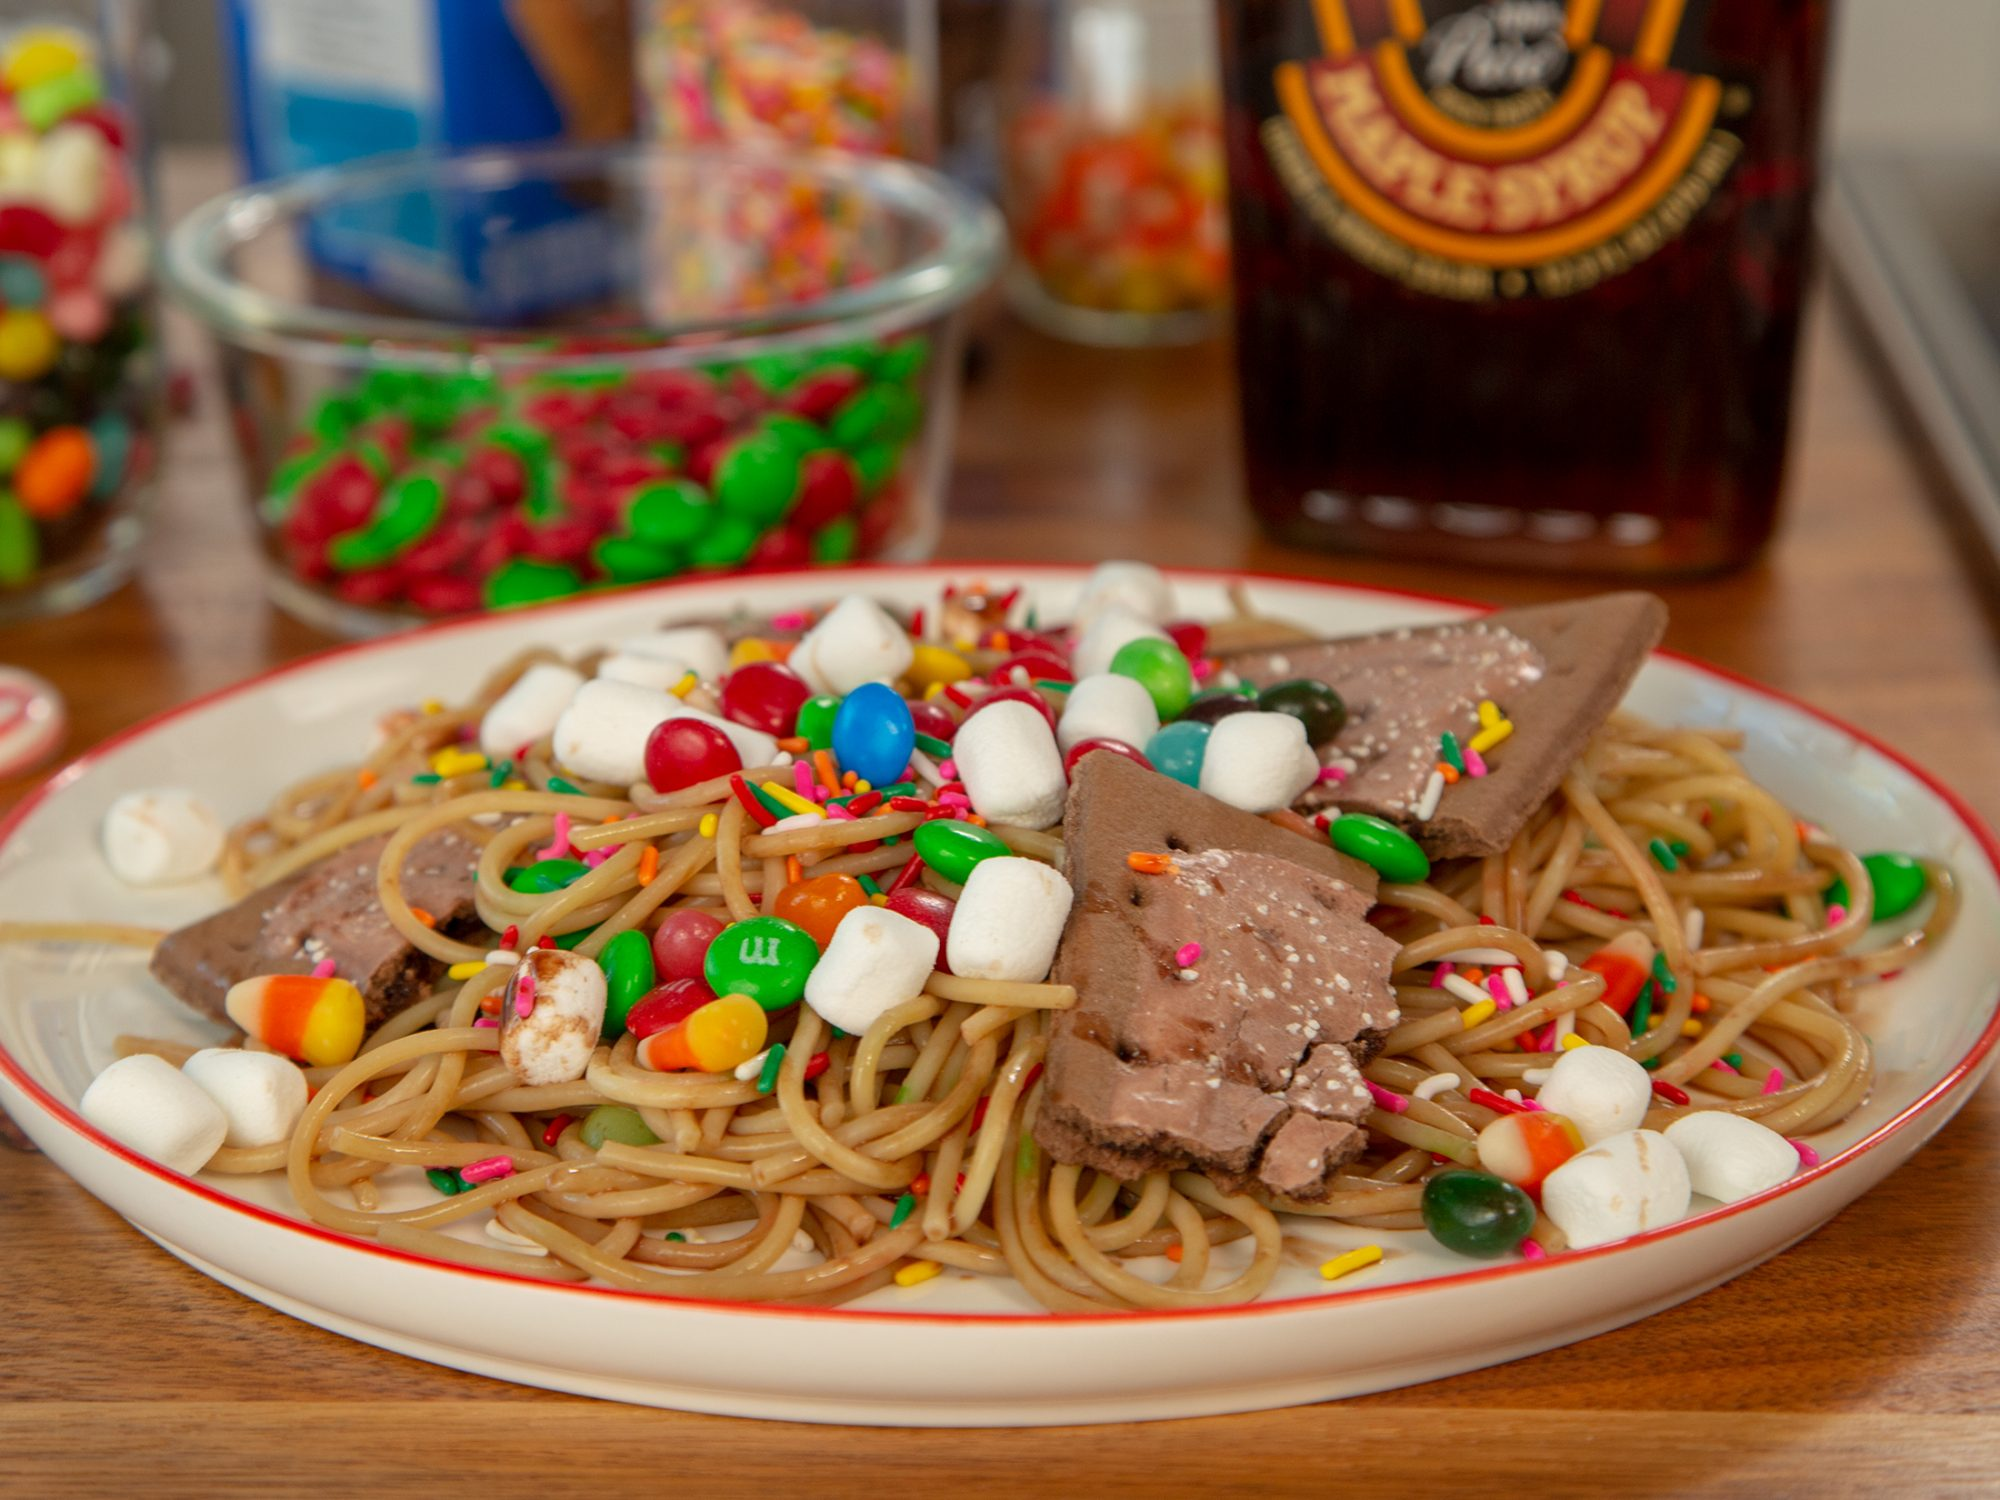 Buddy the Elf's Breakfast Spaghetti image